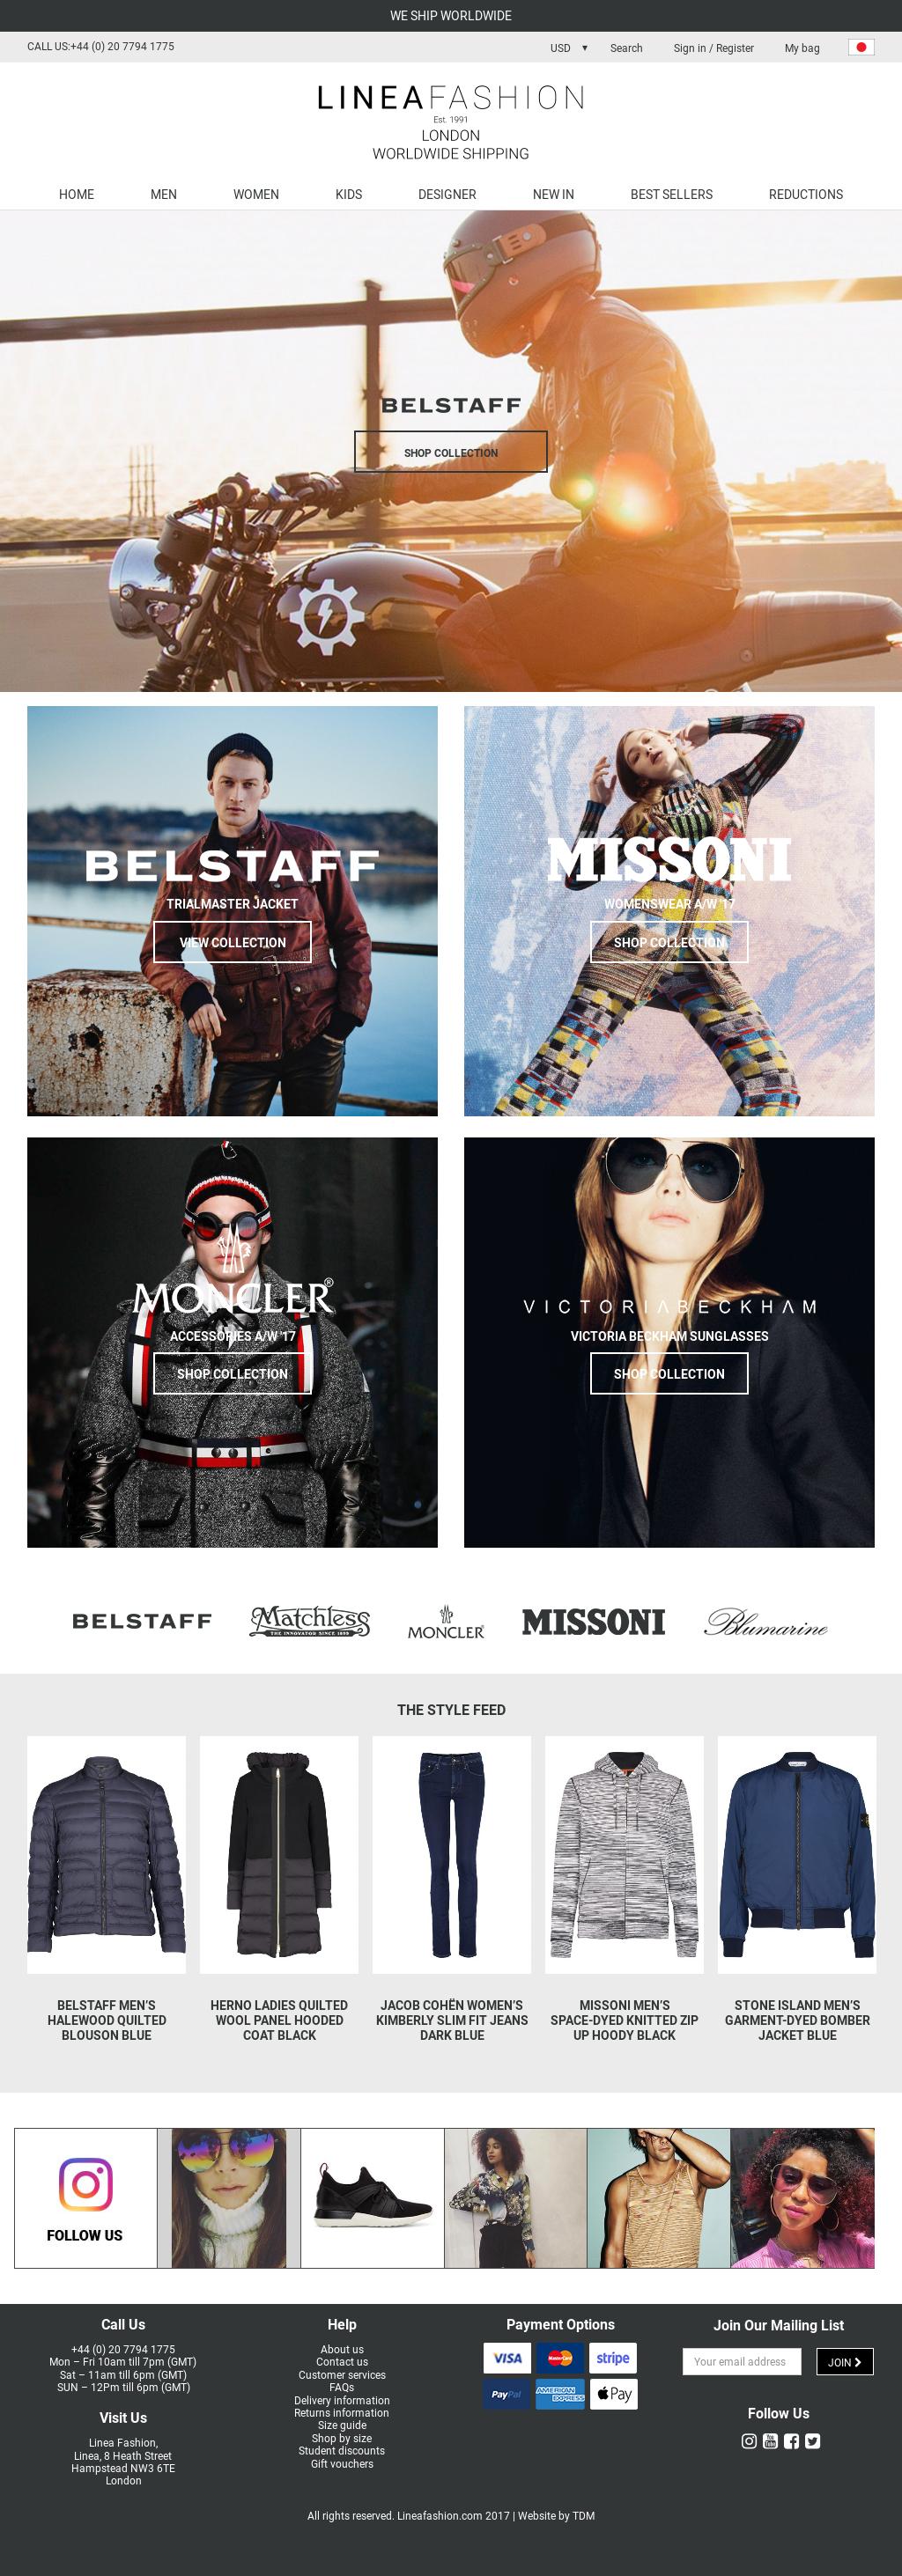 Clothes Designer Website | Linea Fashion Exclusive Designer Clothing London Fashion